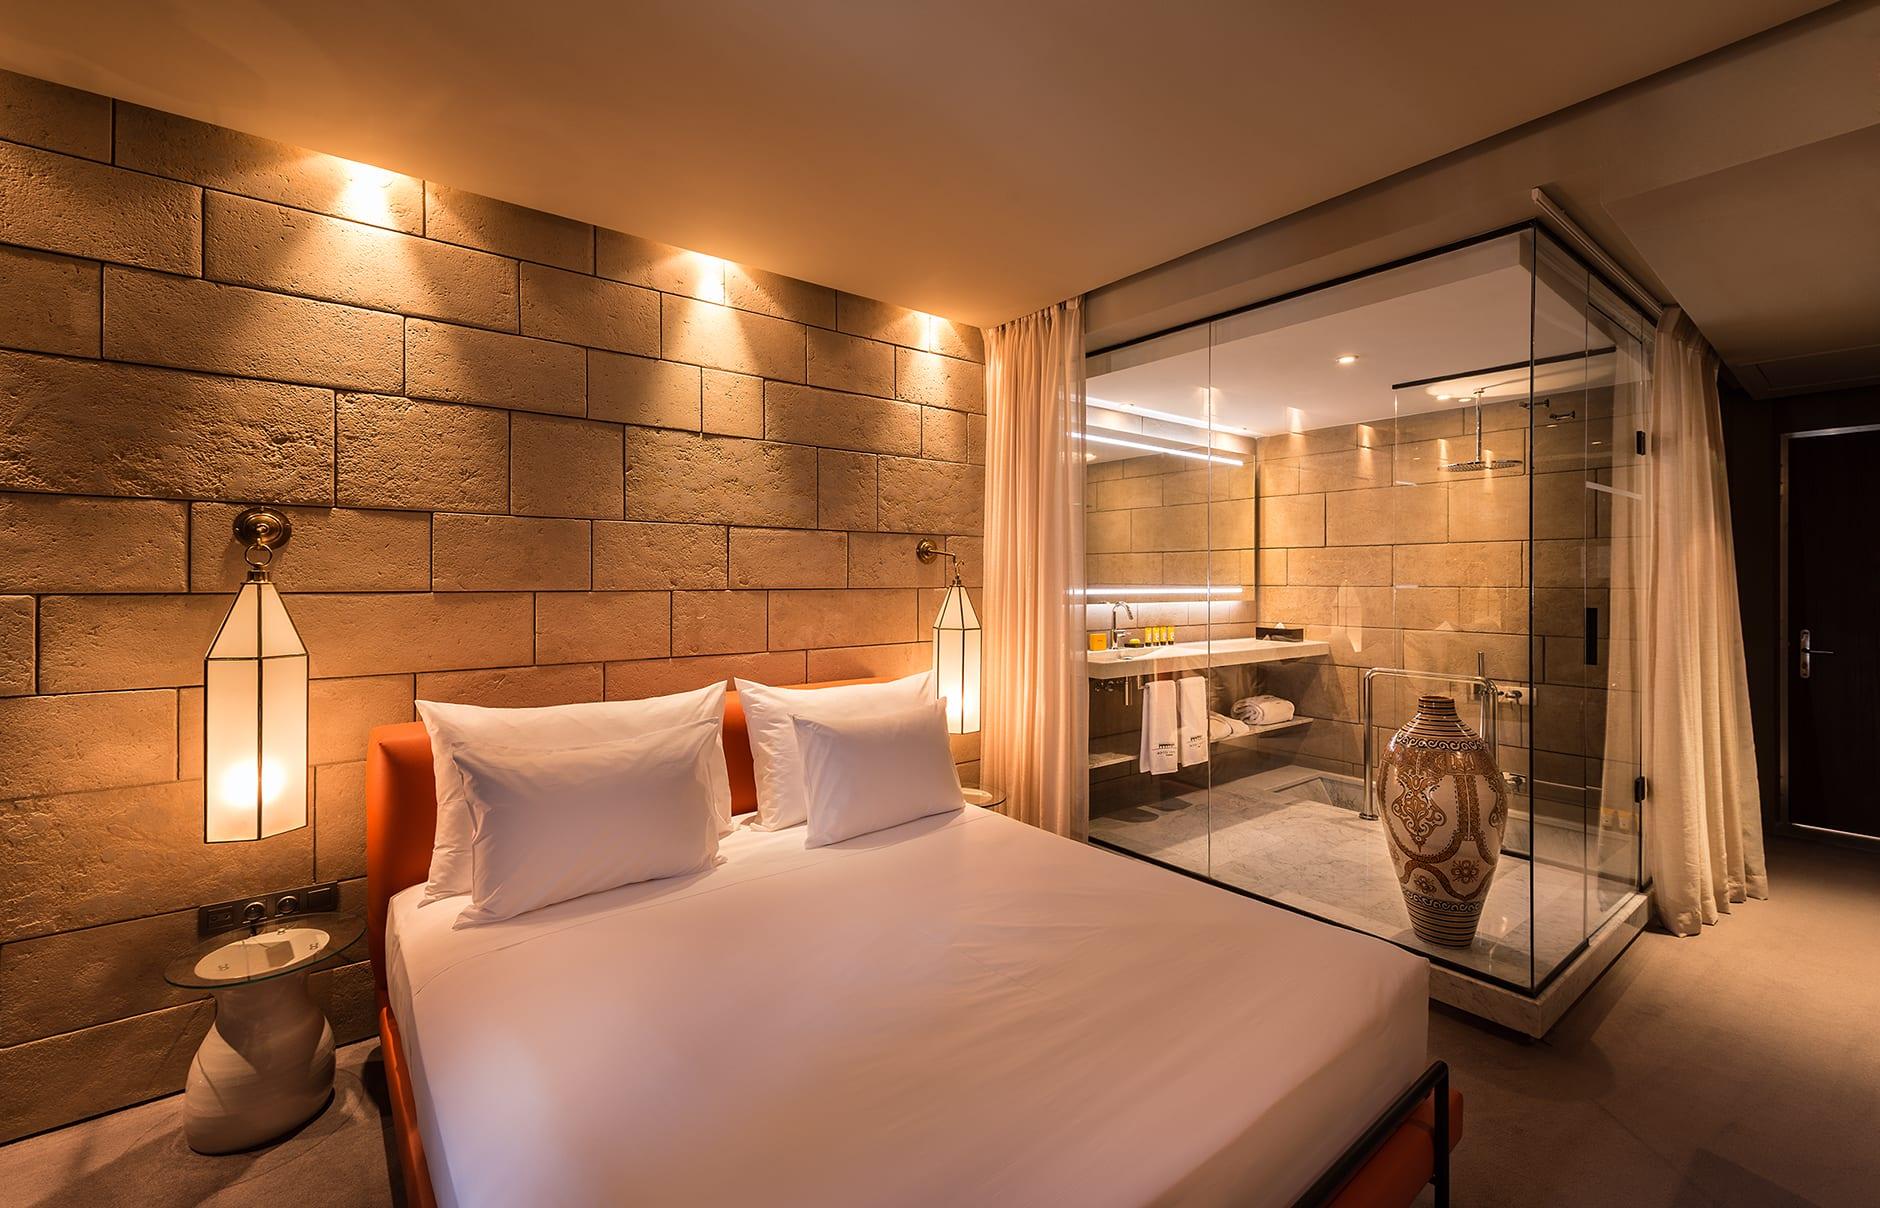 hotel sahrai fez luxury hotels travelplusstyle. Black Bedroom Furniture Sets. Home Design Ideas